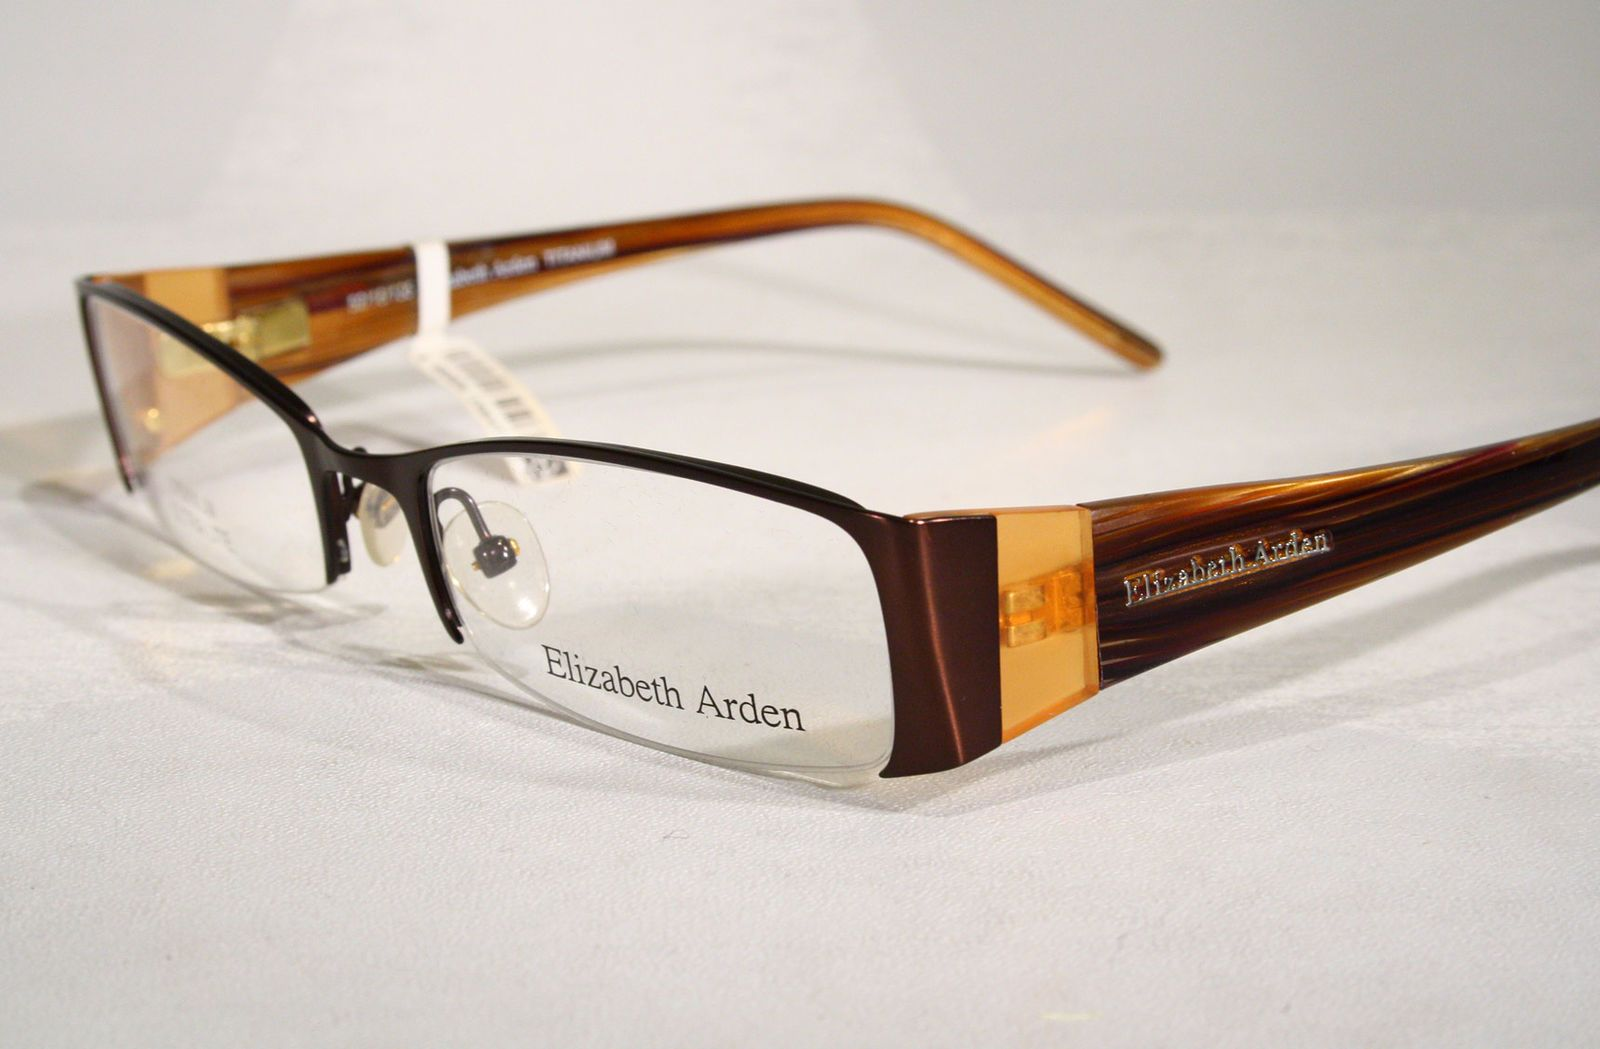 37919a97b Titanium Semi Rimless ELIZABETH ARDEN Women's Copper Brown Eyeglass Frames  @ eBay (RipVanW)